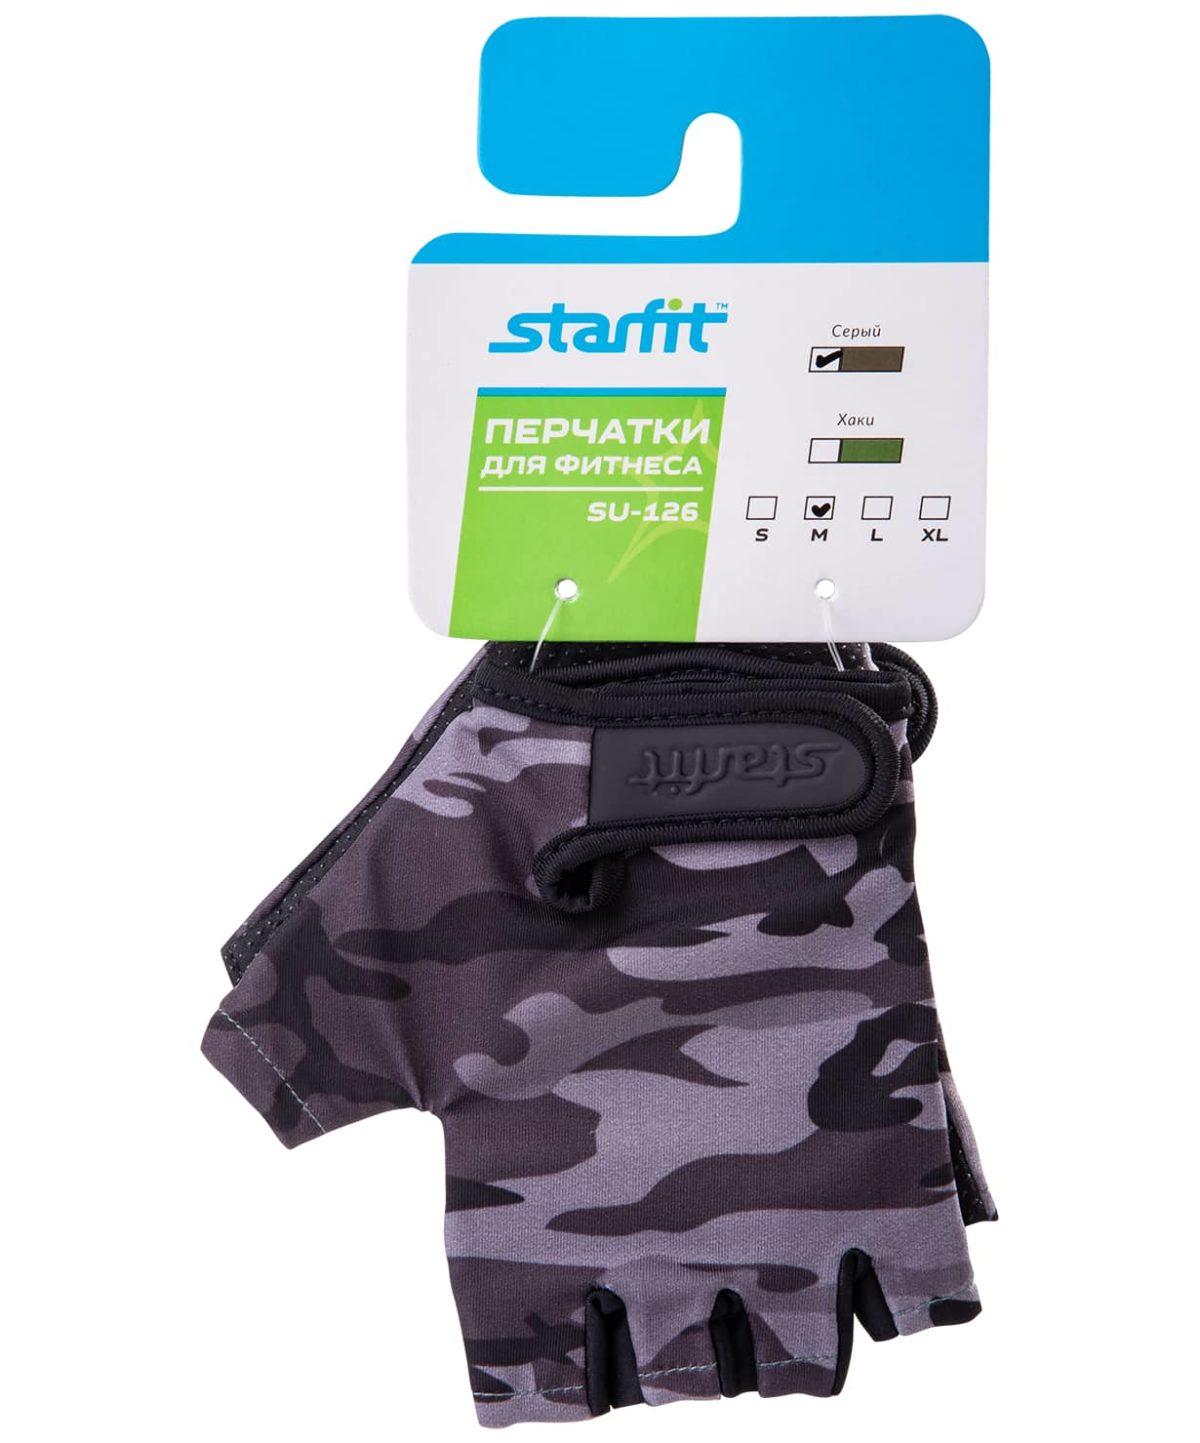 STARFIT перчатки д/фитнеса  SU-126 - 3